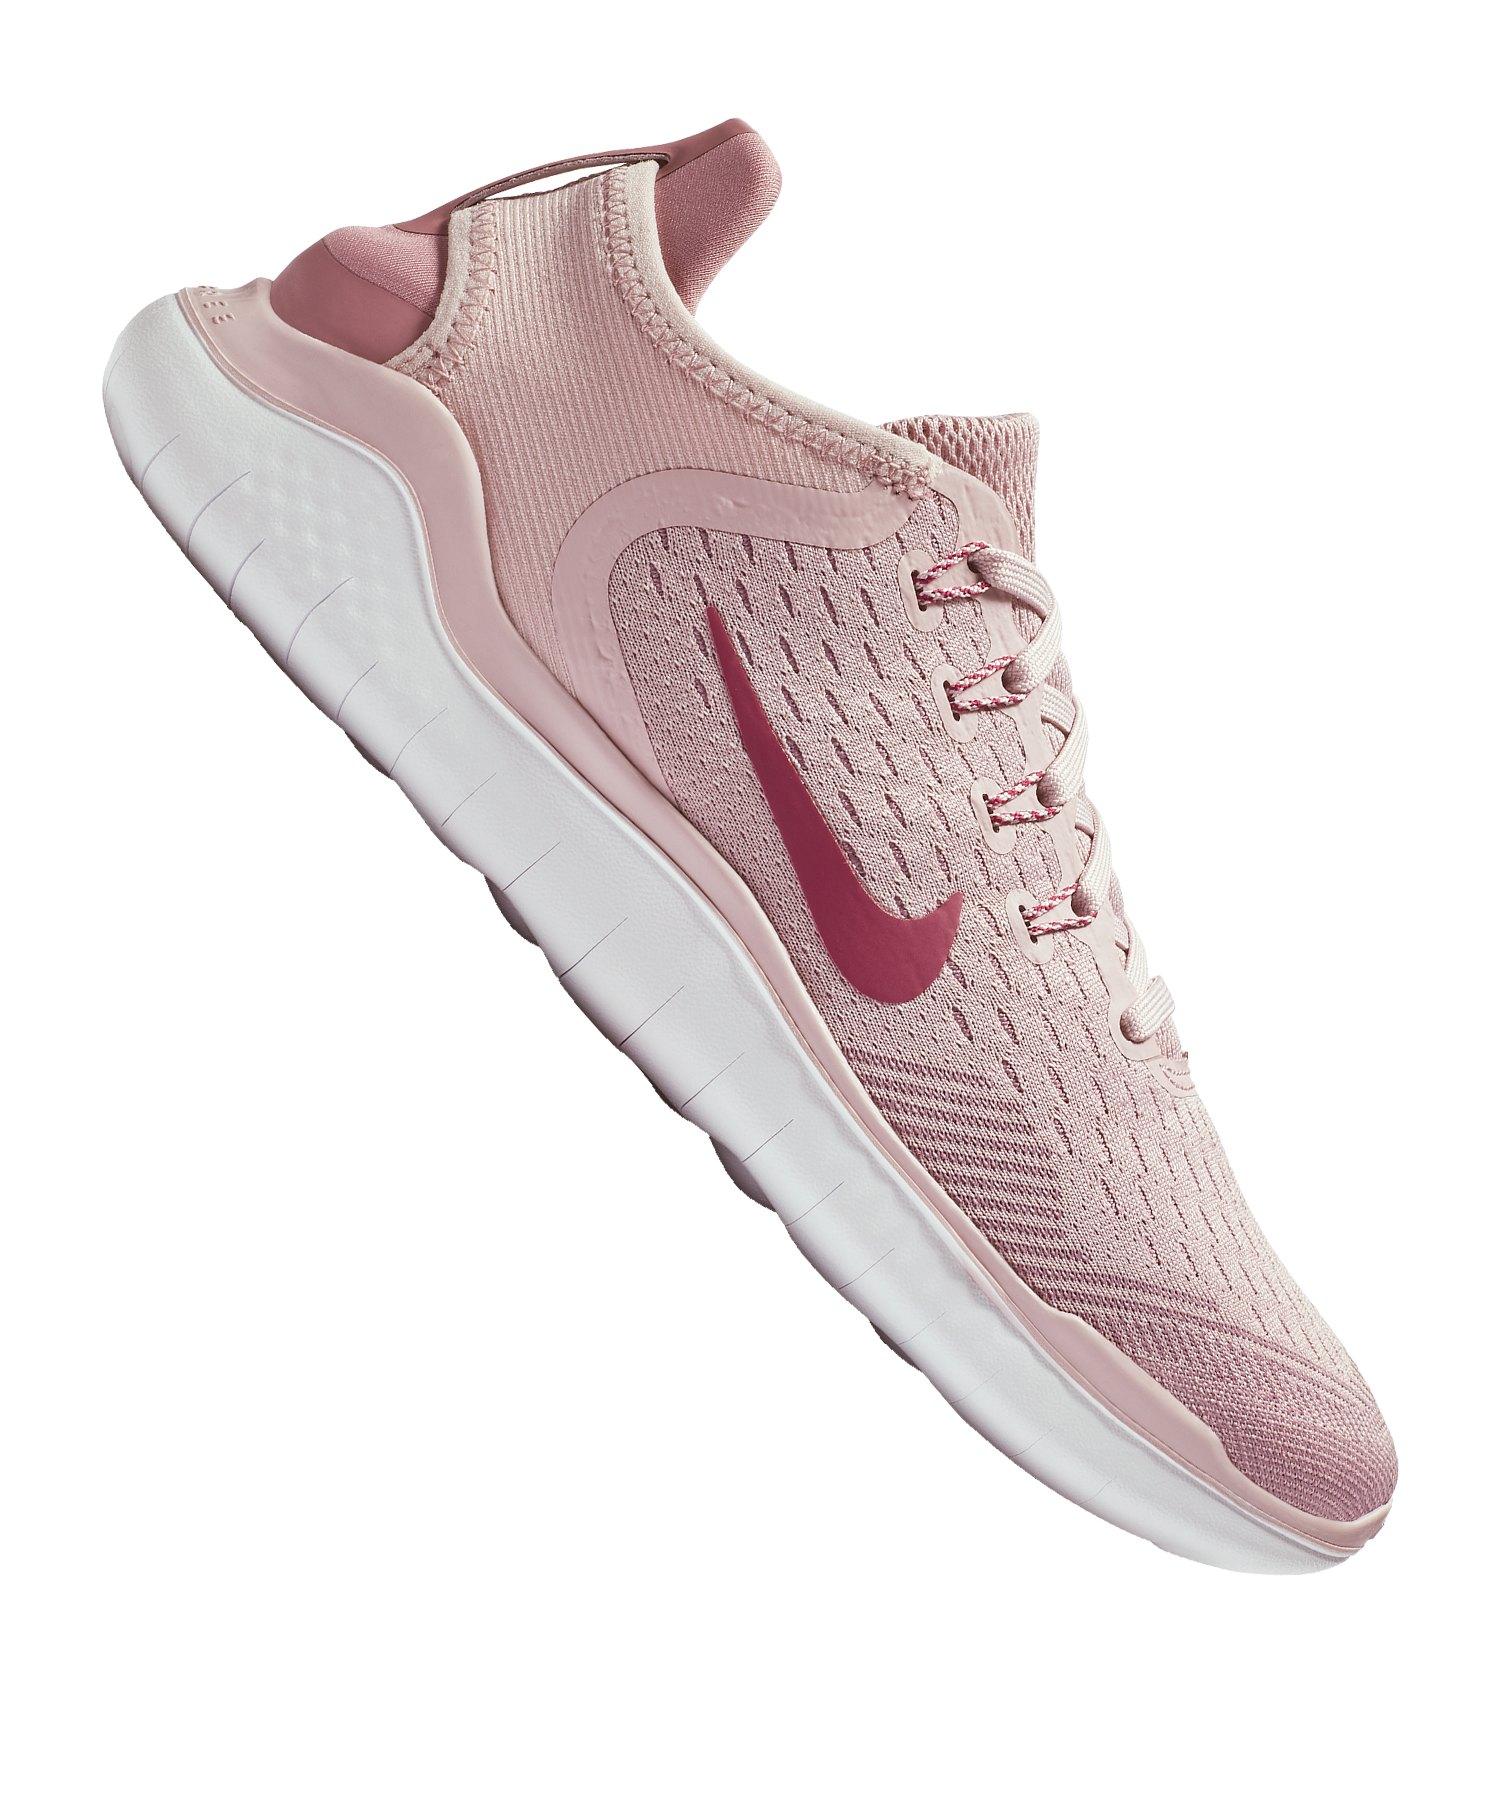 Nike Free RN 2018 Running Damen Rosa F500 |Laufschuh | Lauftraining ...